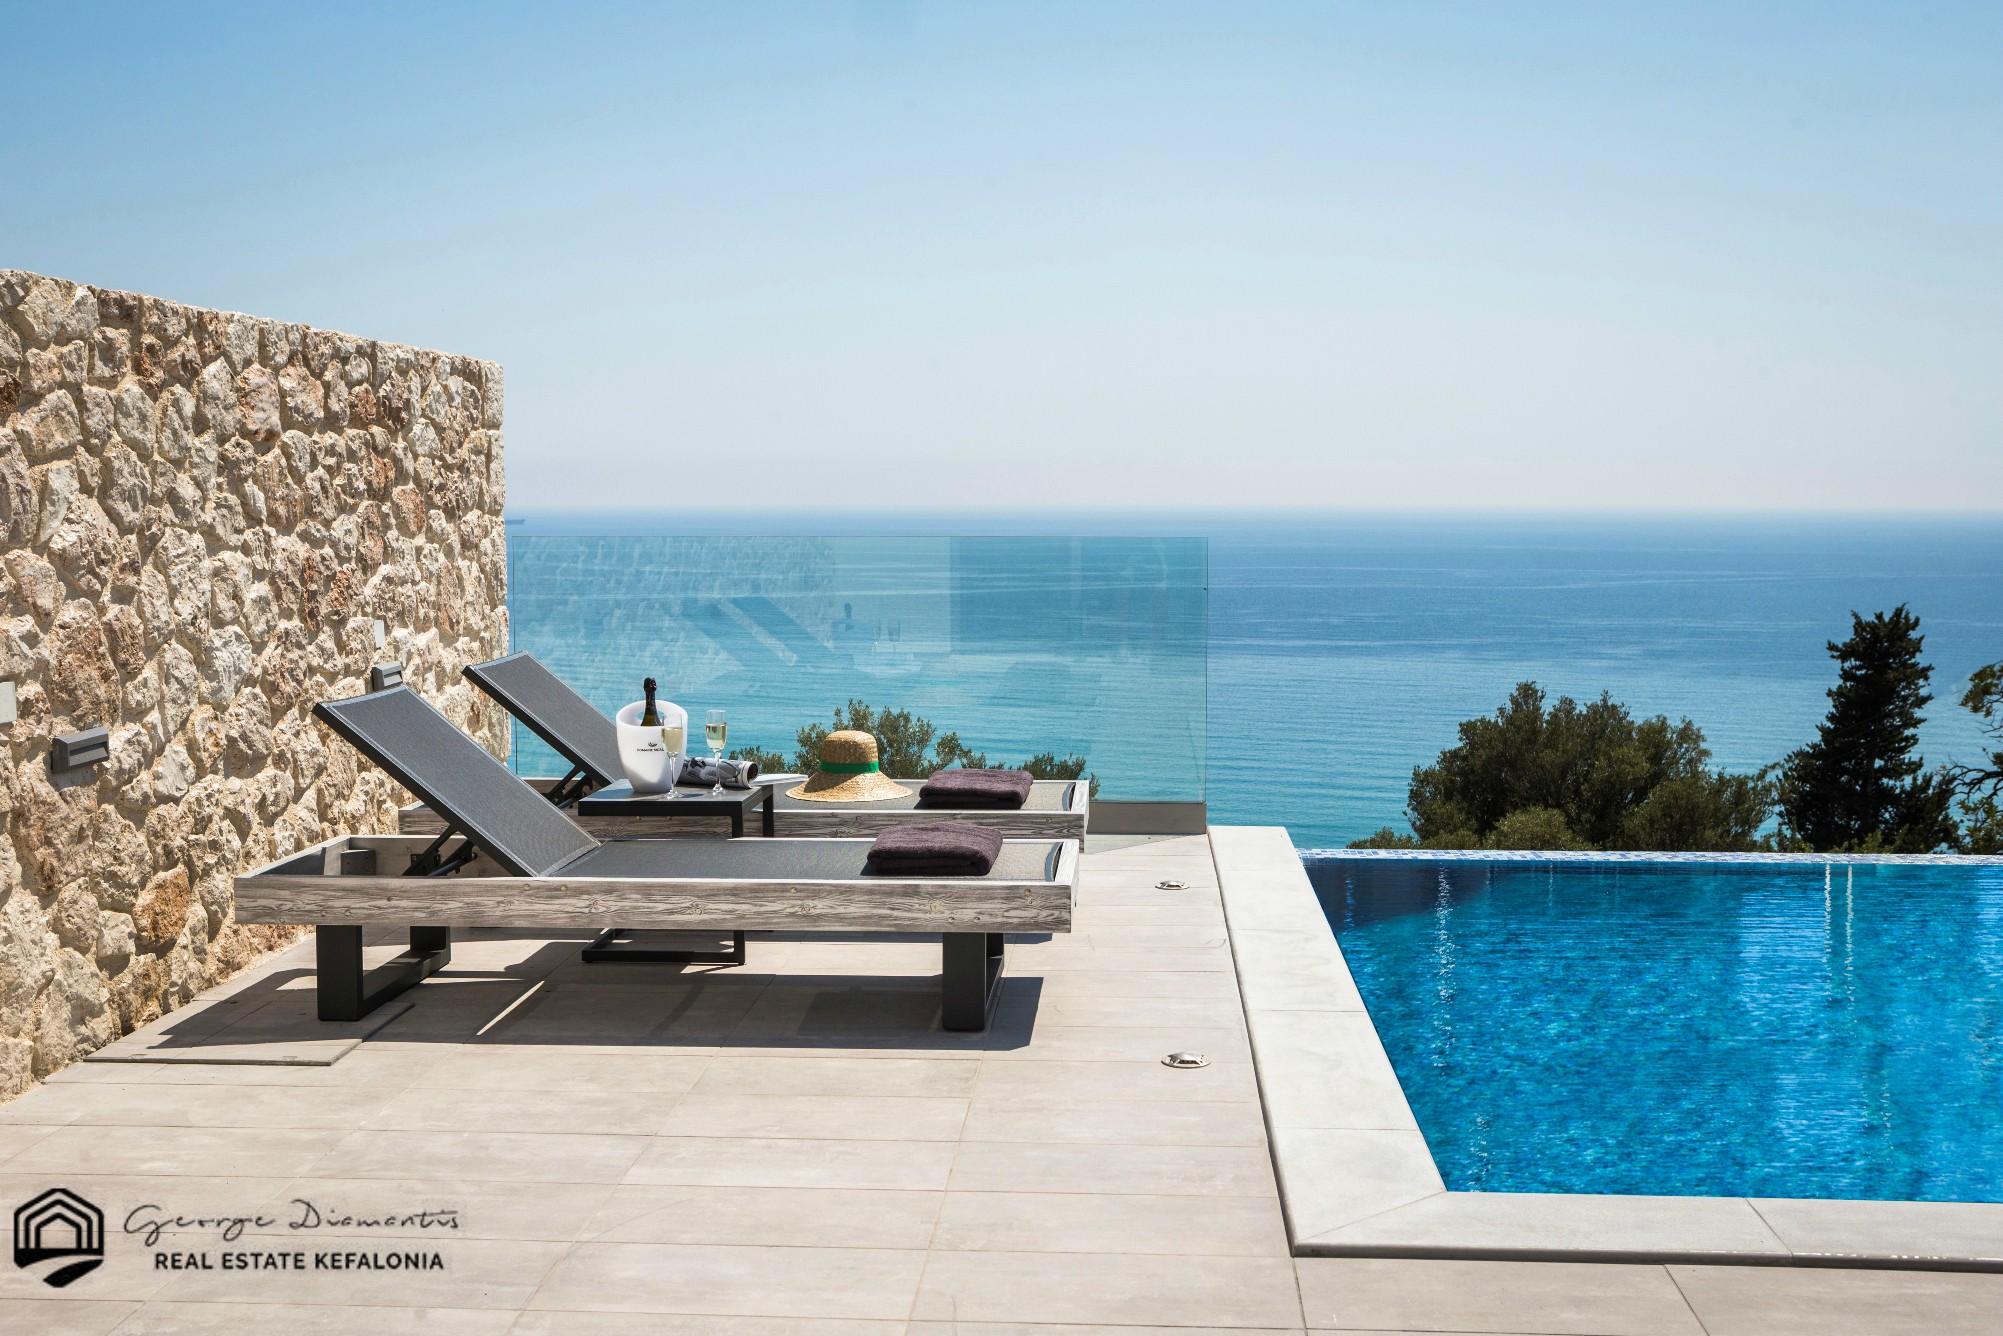 Luxury 2 Bedroom Villa In Lourdata